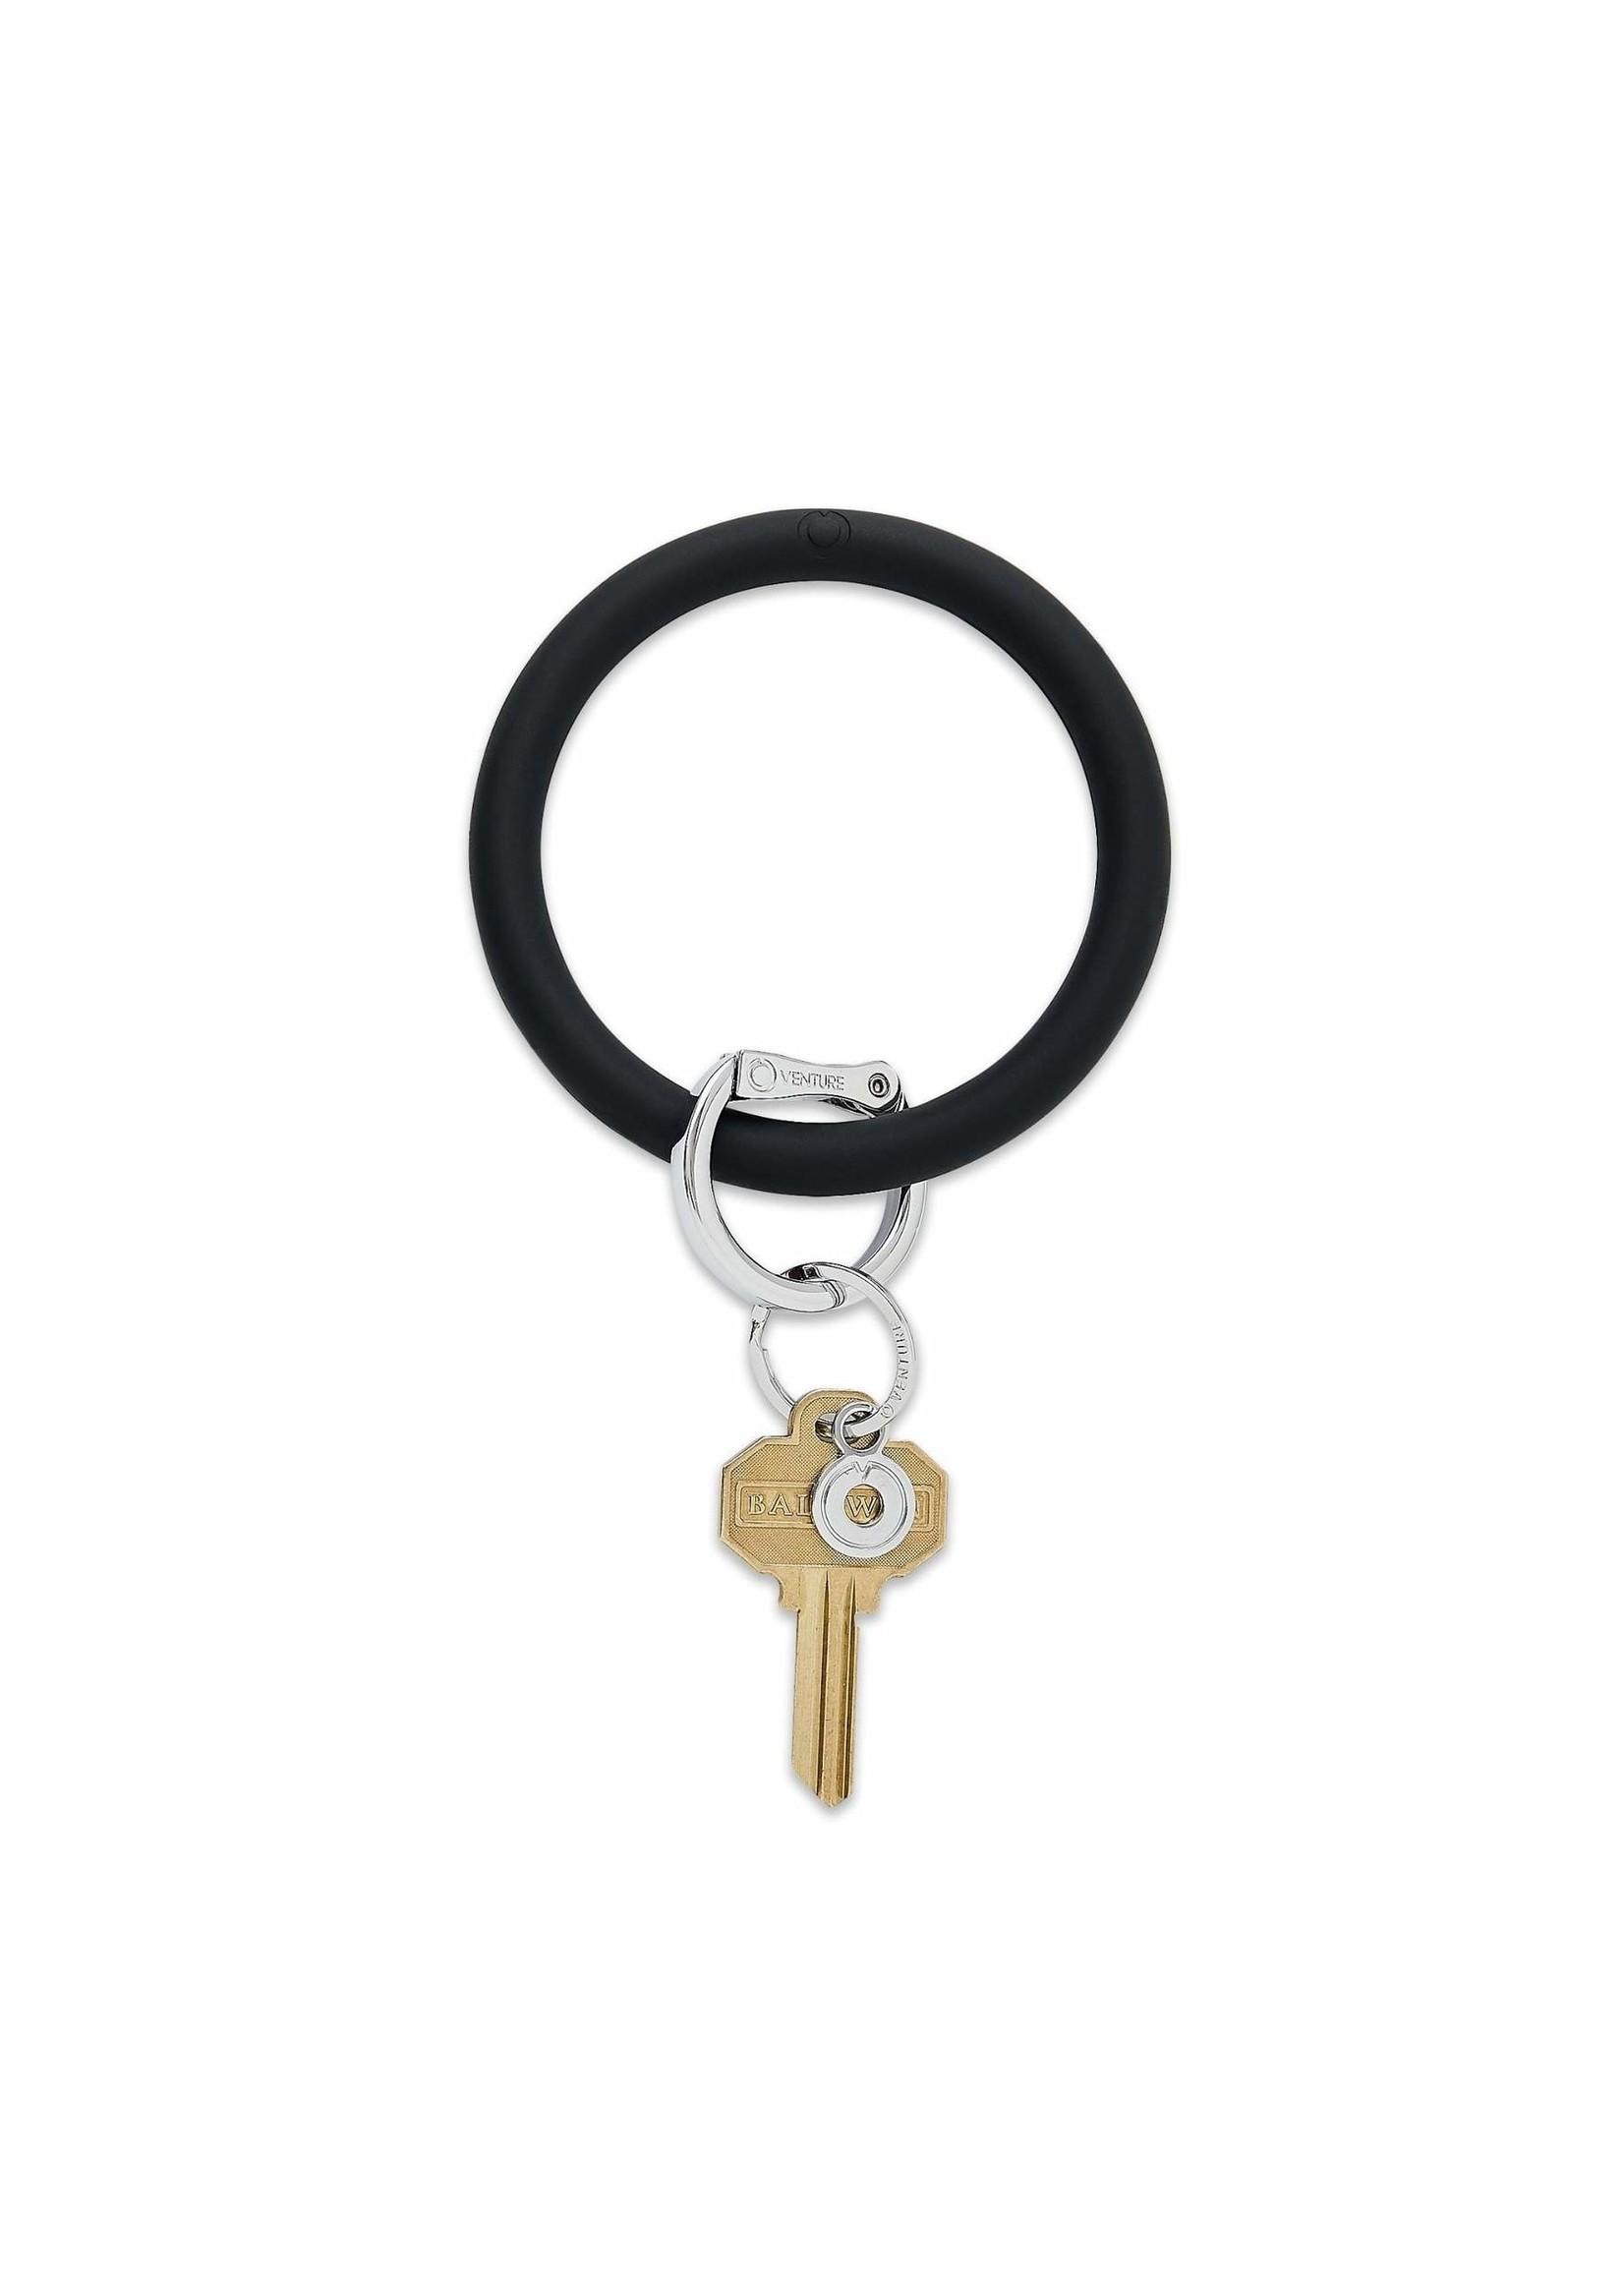 O-venture Silicone Key Ring - Black